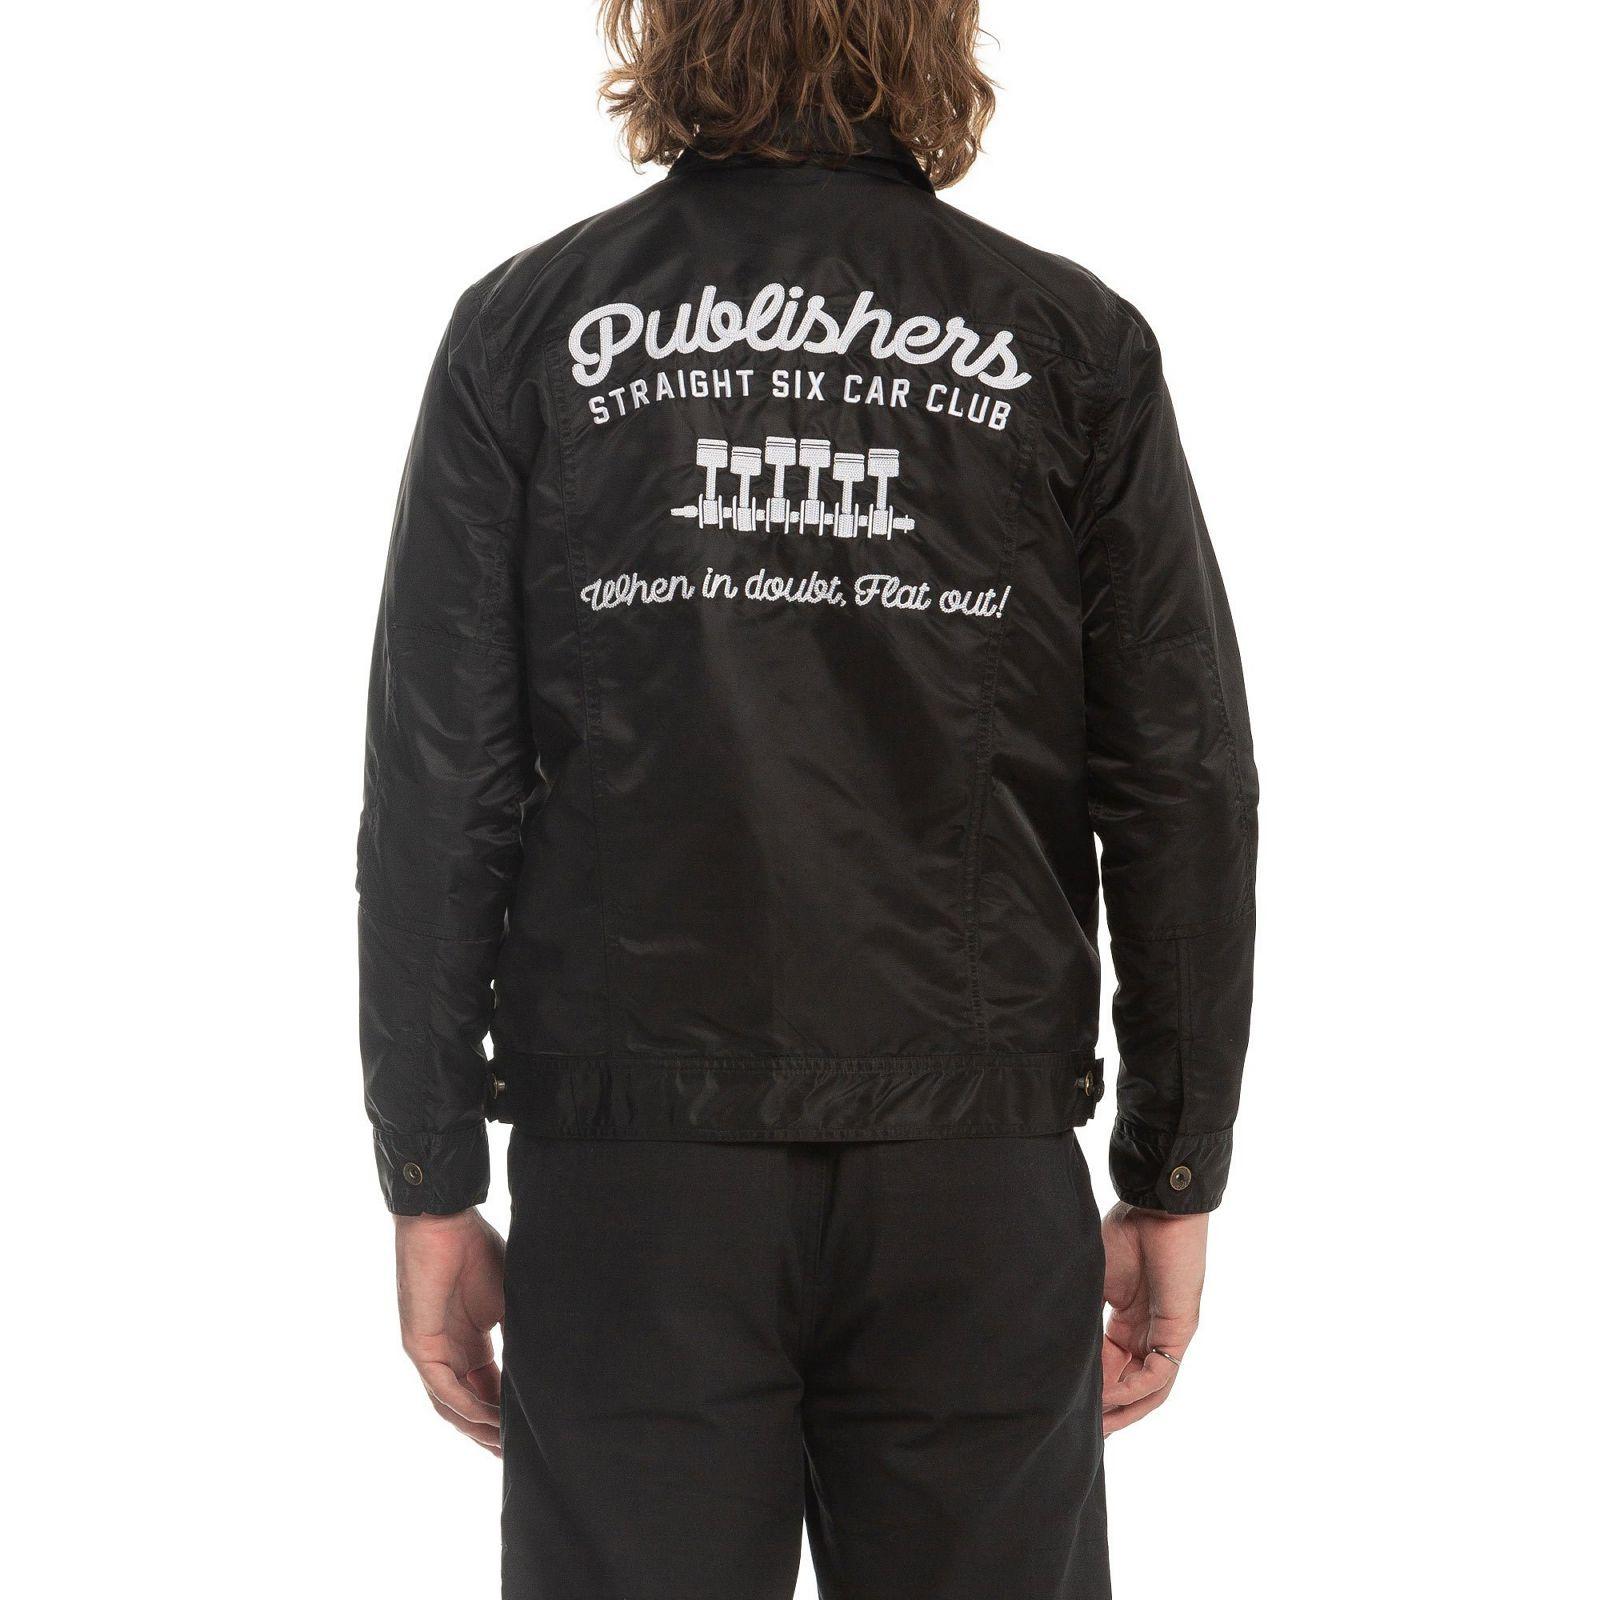 【PUBLISH BRAND/パブリッシュブランド】CLUB  ナイロンワークジャケット / BLACK